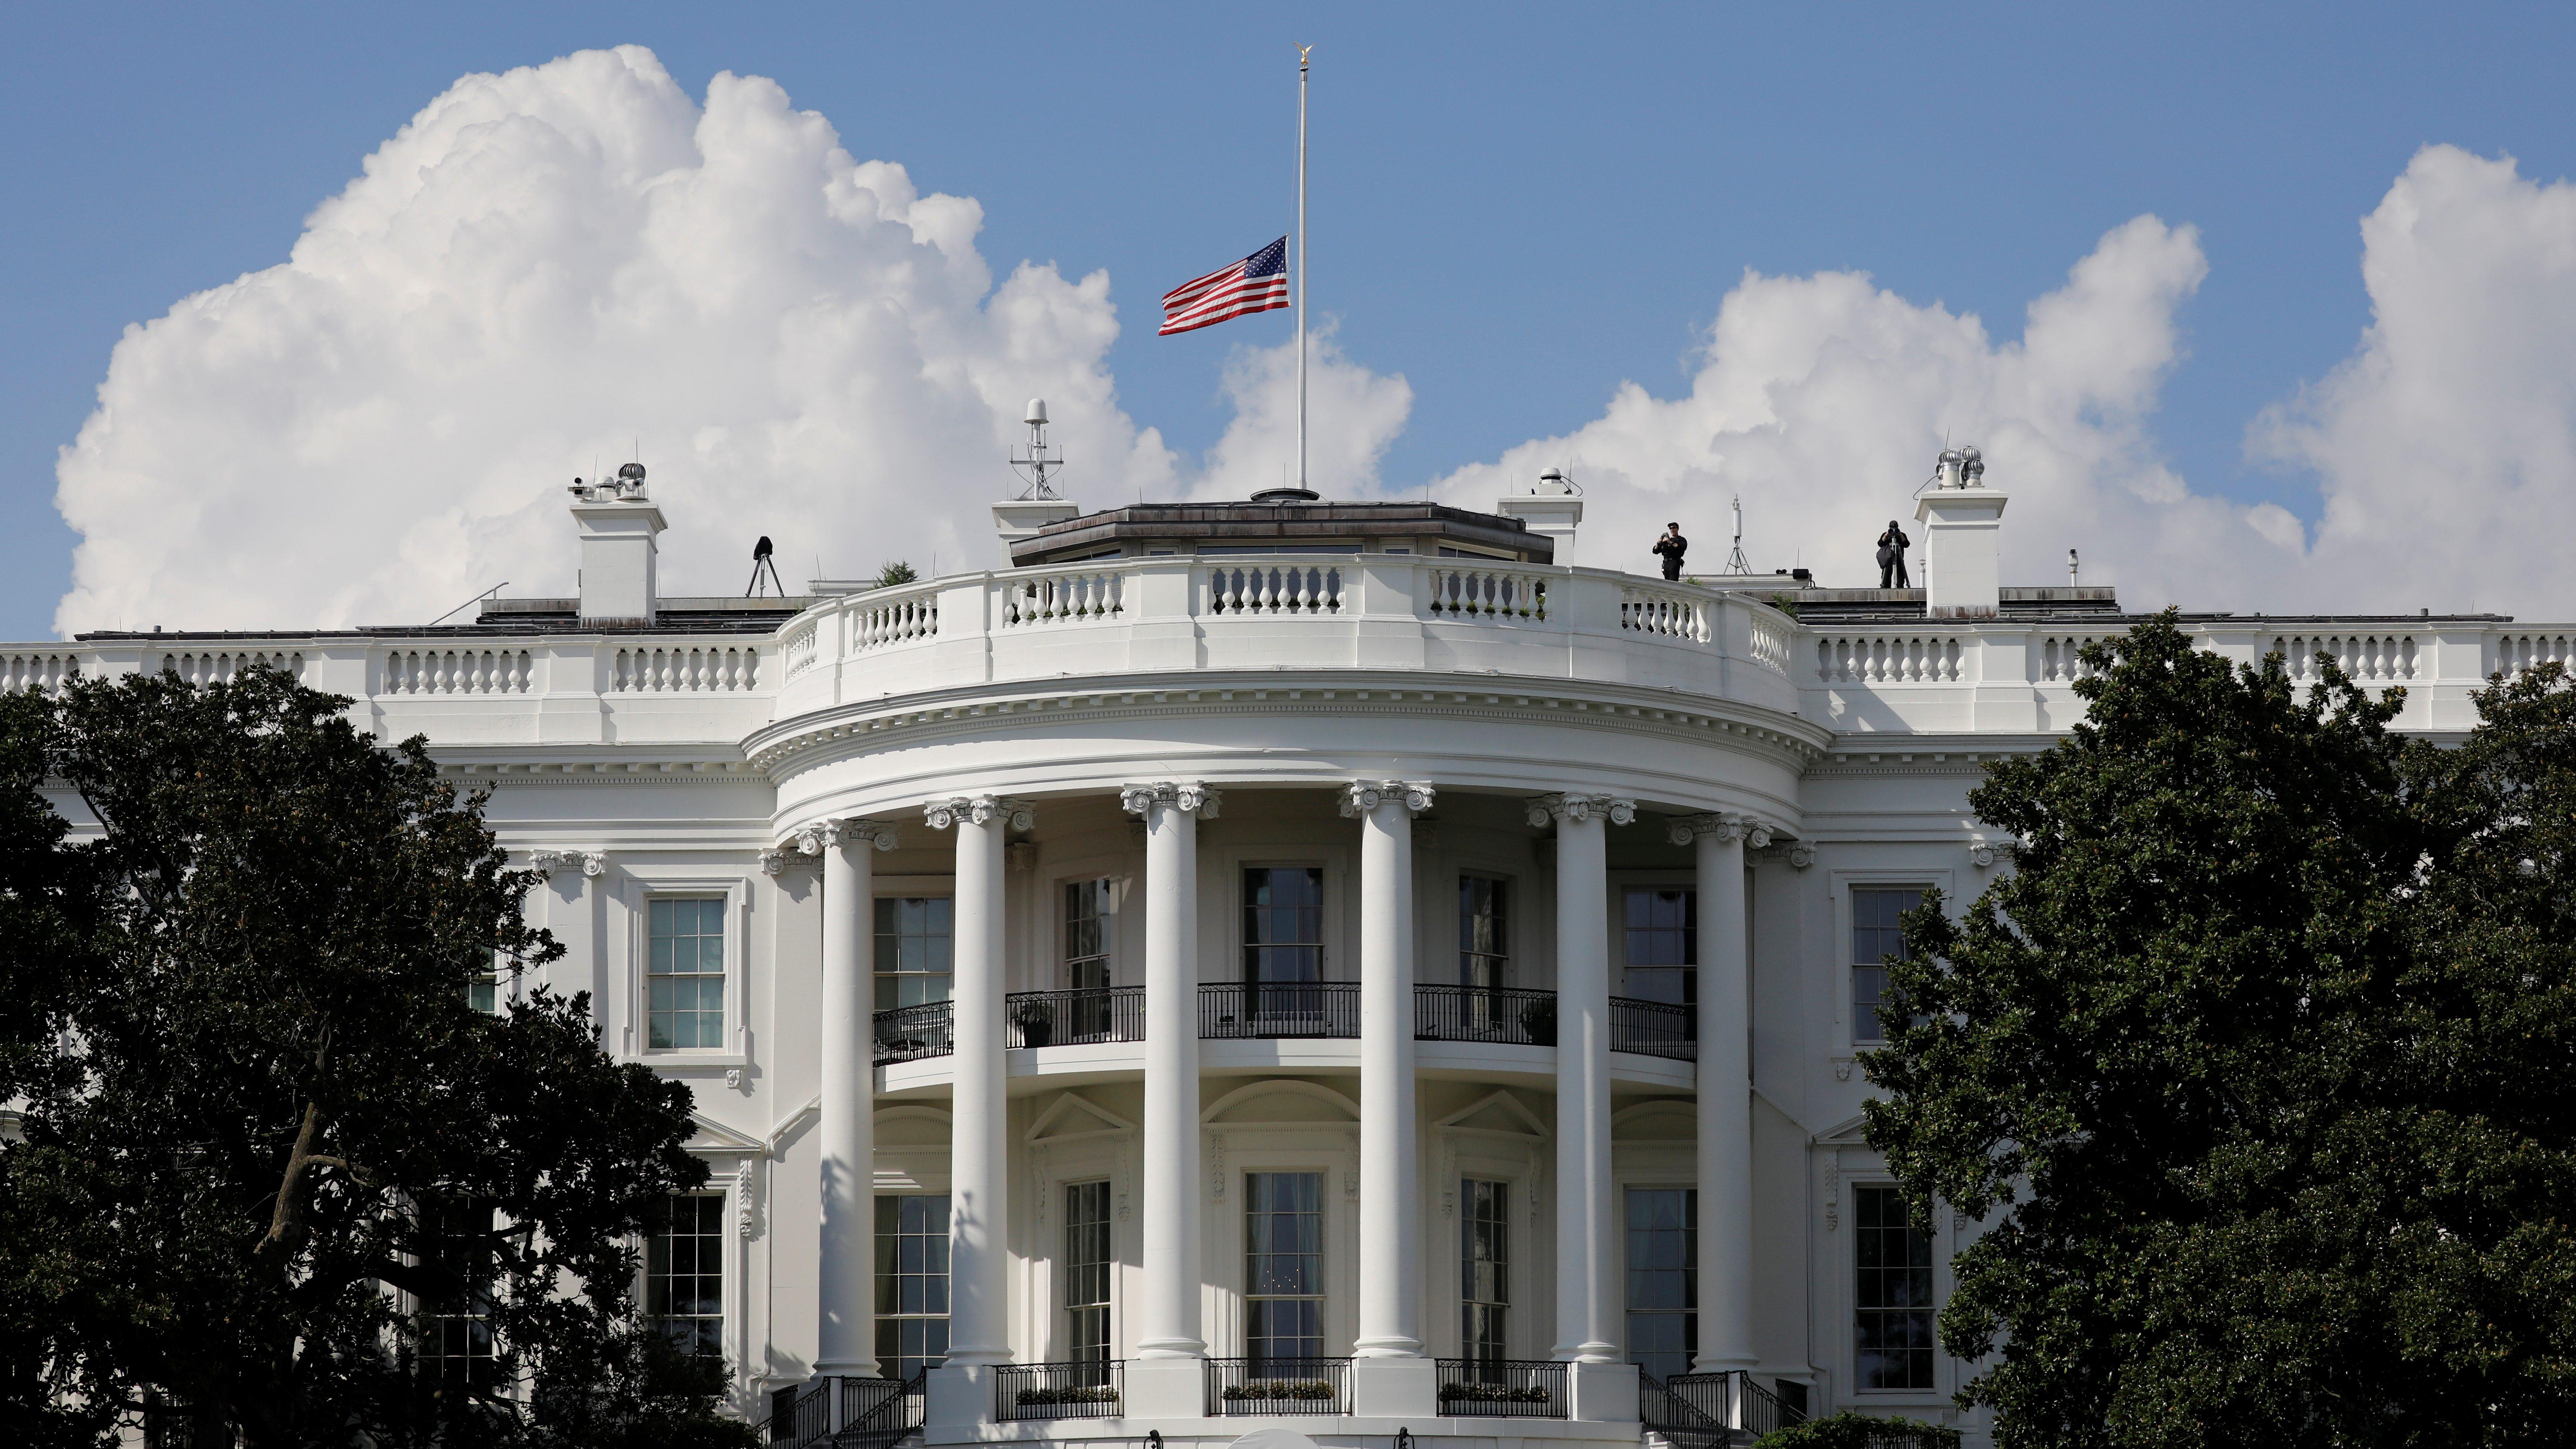 White House flag at half-mast.